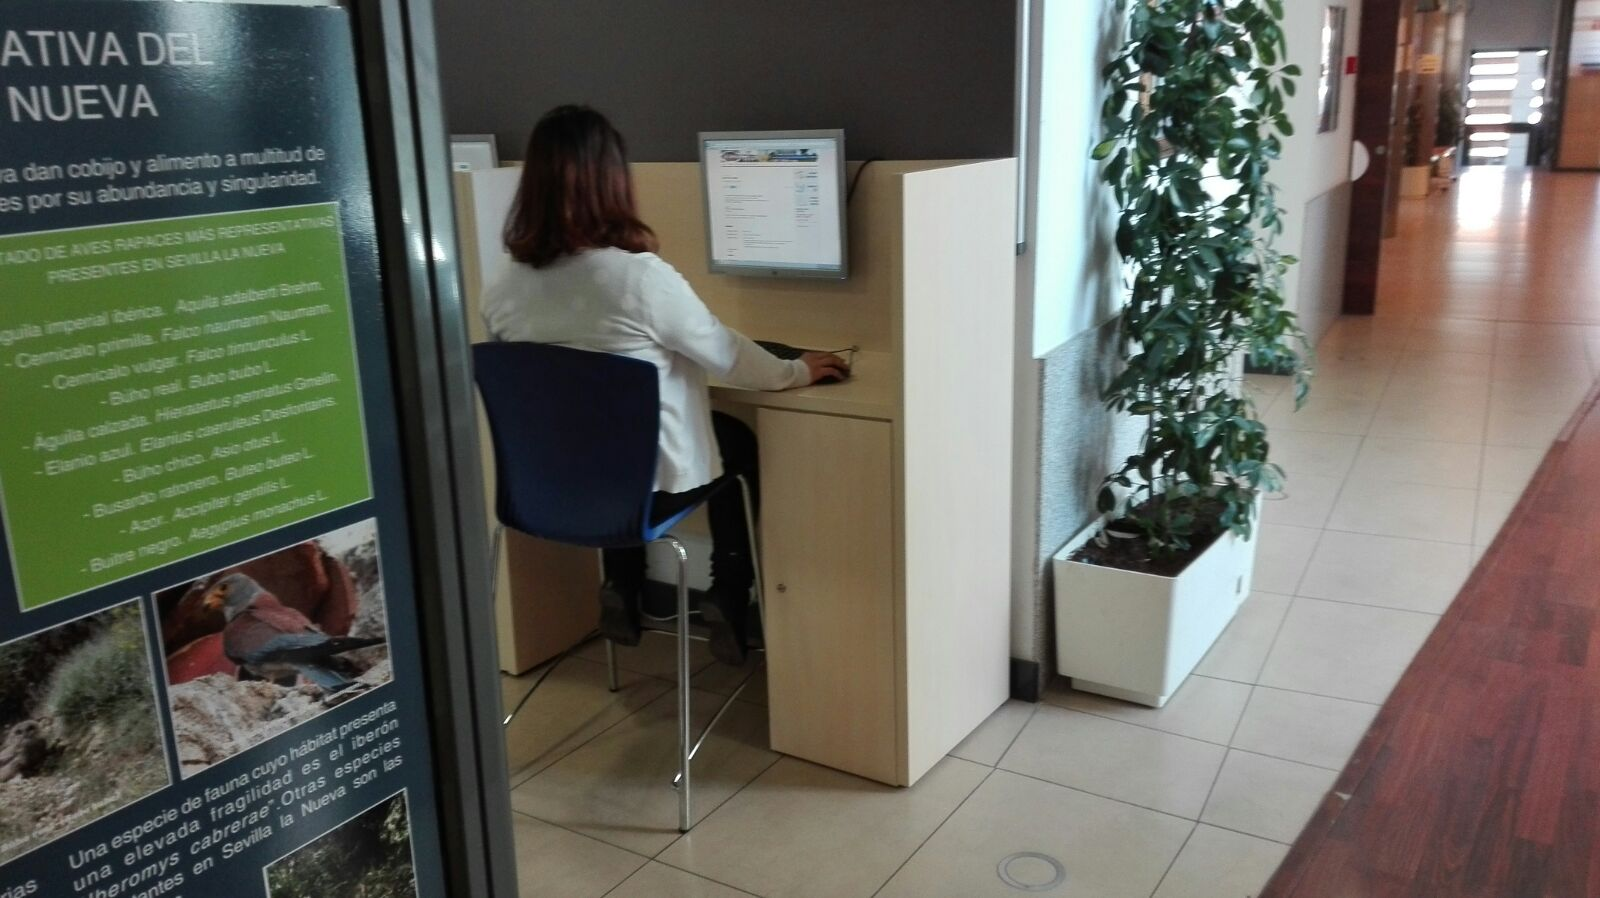 Empleo a21 peri dico gratuito sierra oeste de madrid for Consulta demanda de empleo